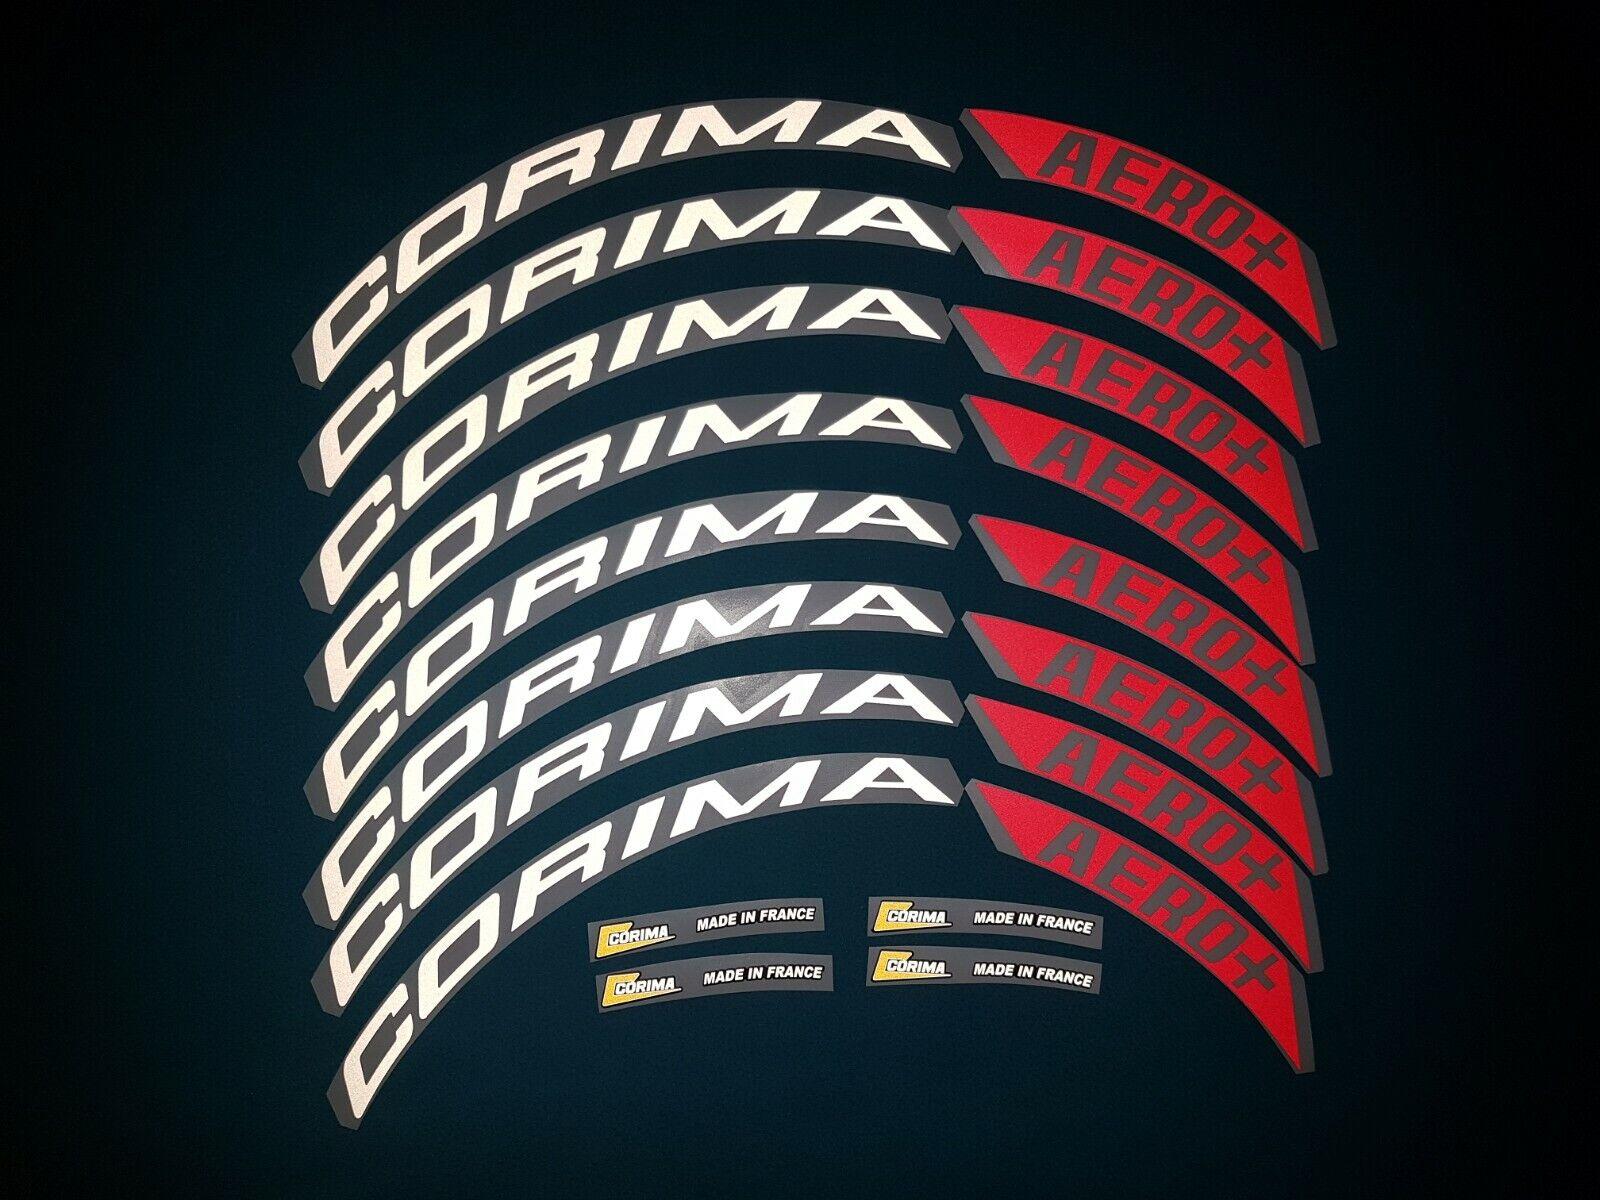 CORIMA AERO +  WHITE   RED REFLECTIVE     REPLACEMENT RIM DECAL SET FOR TWO RIMS